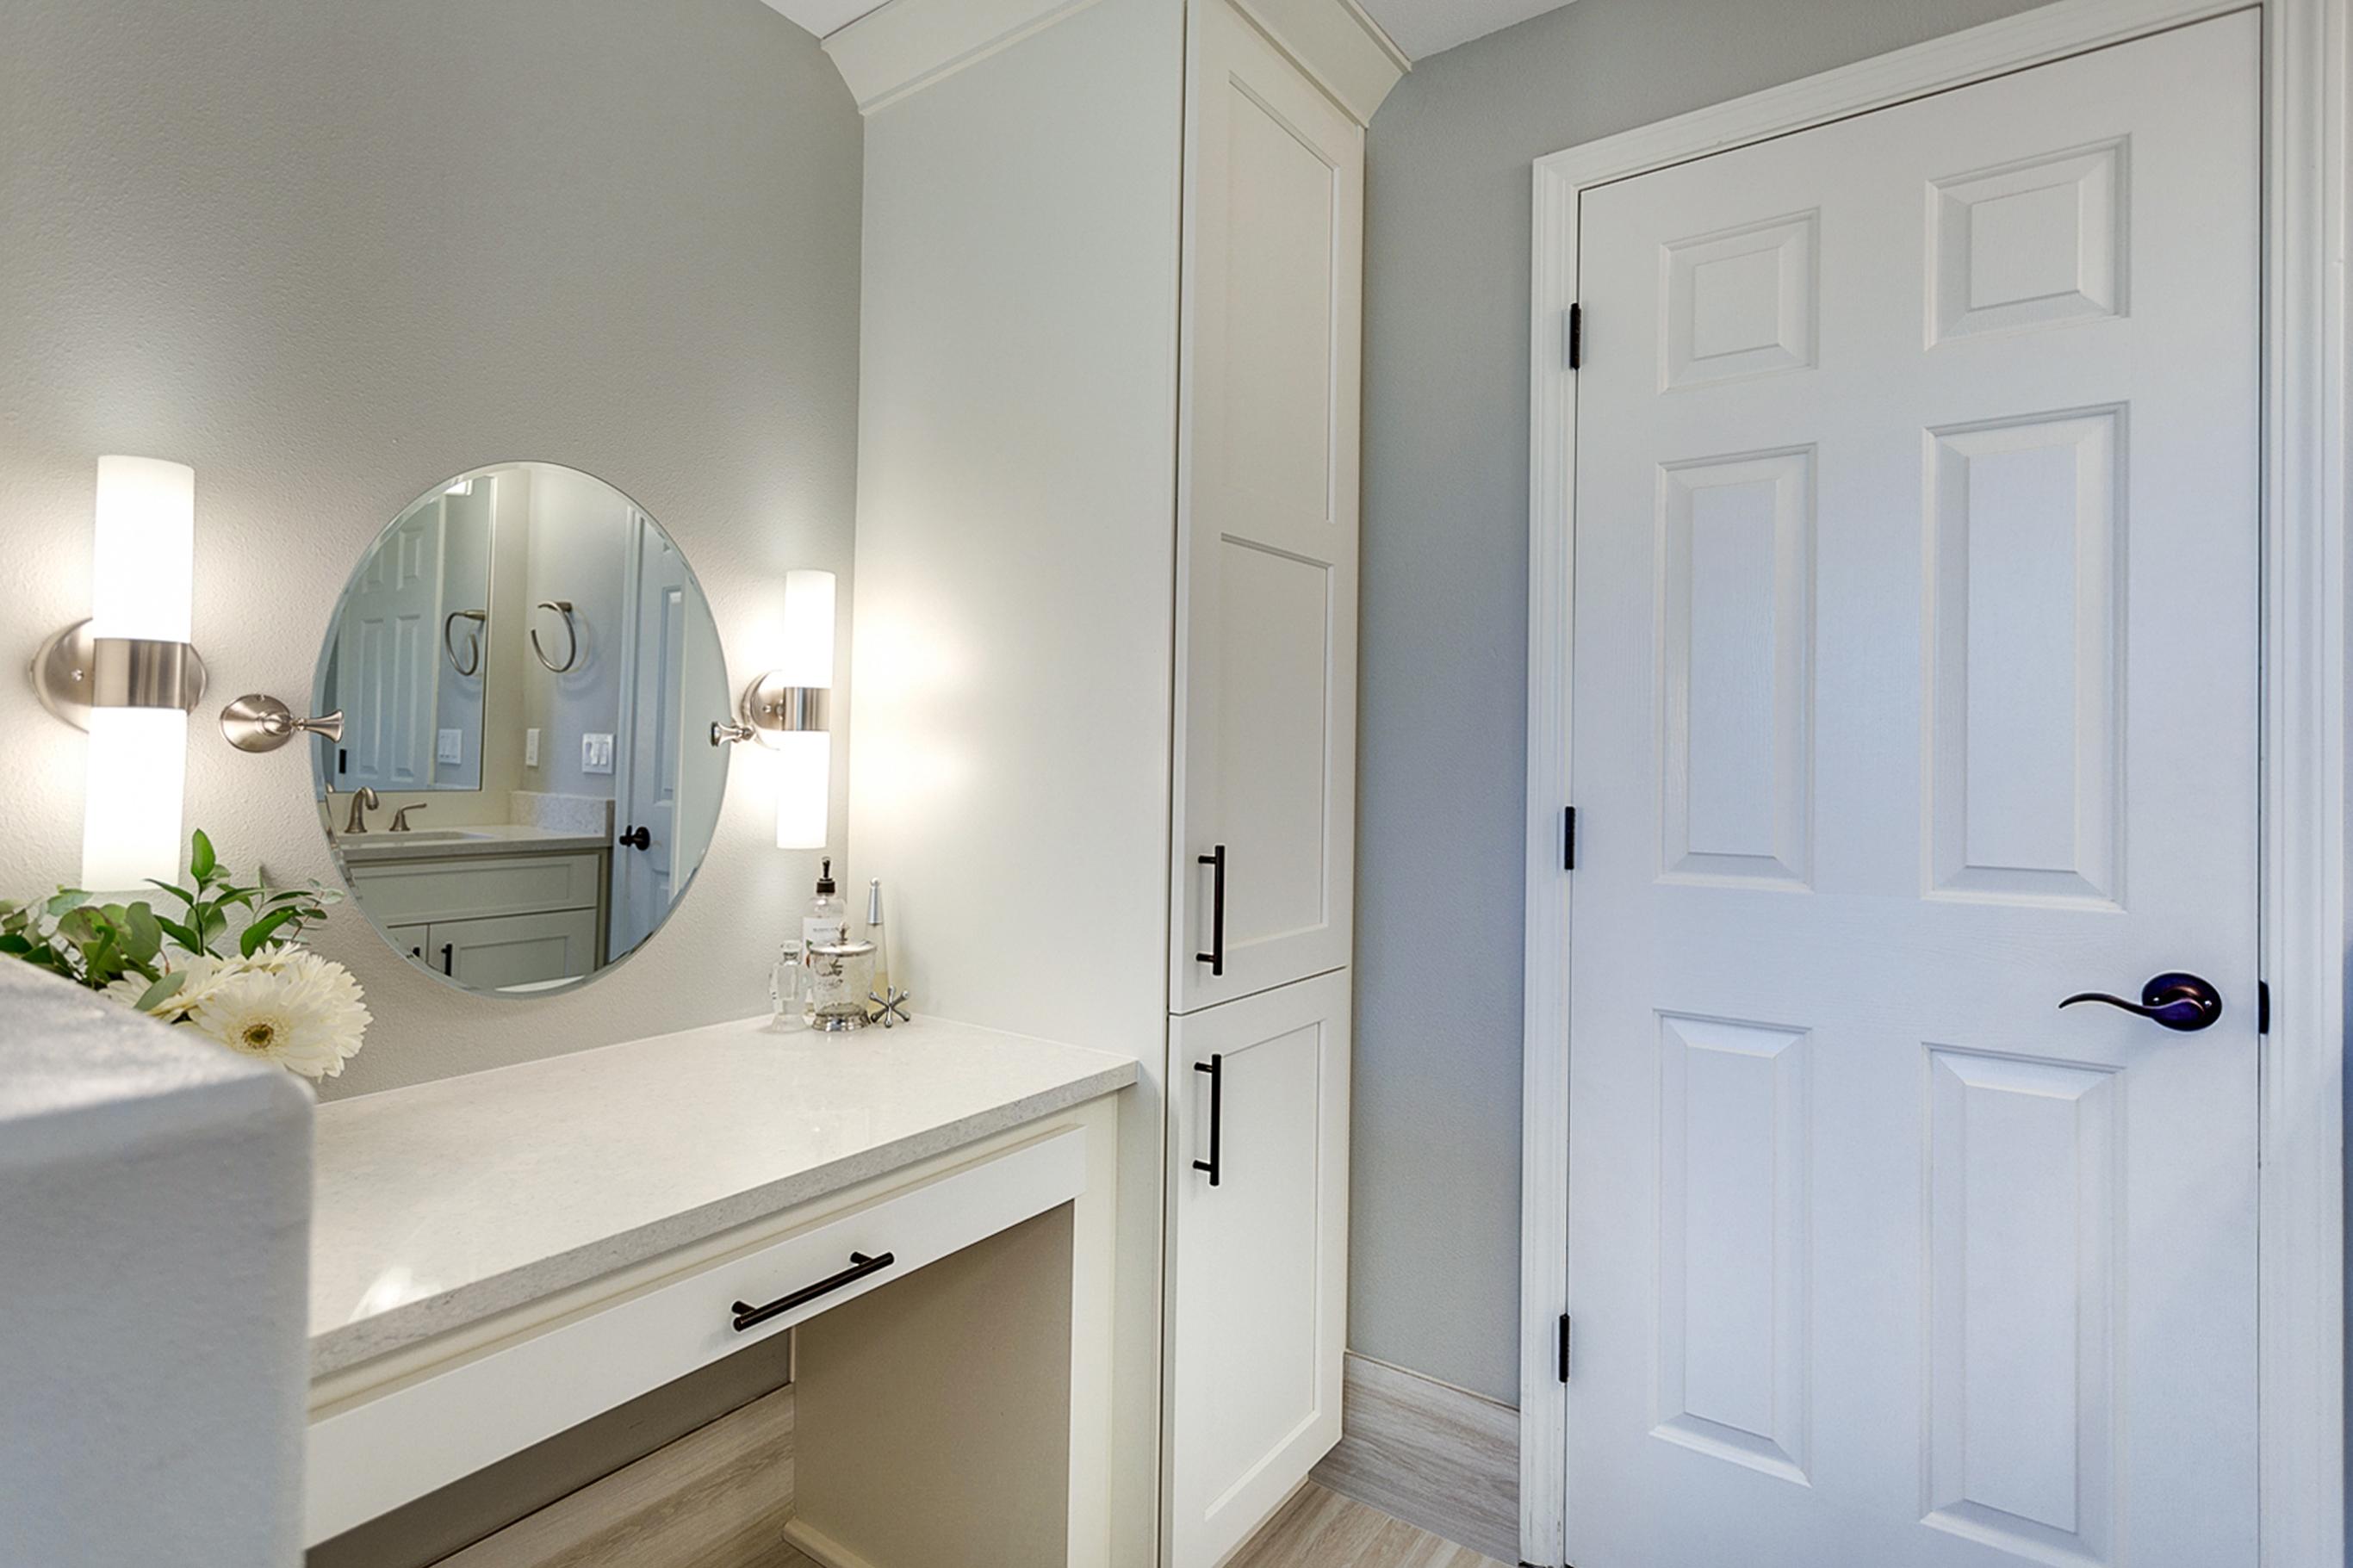 White Vanity Cabinets